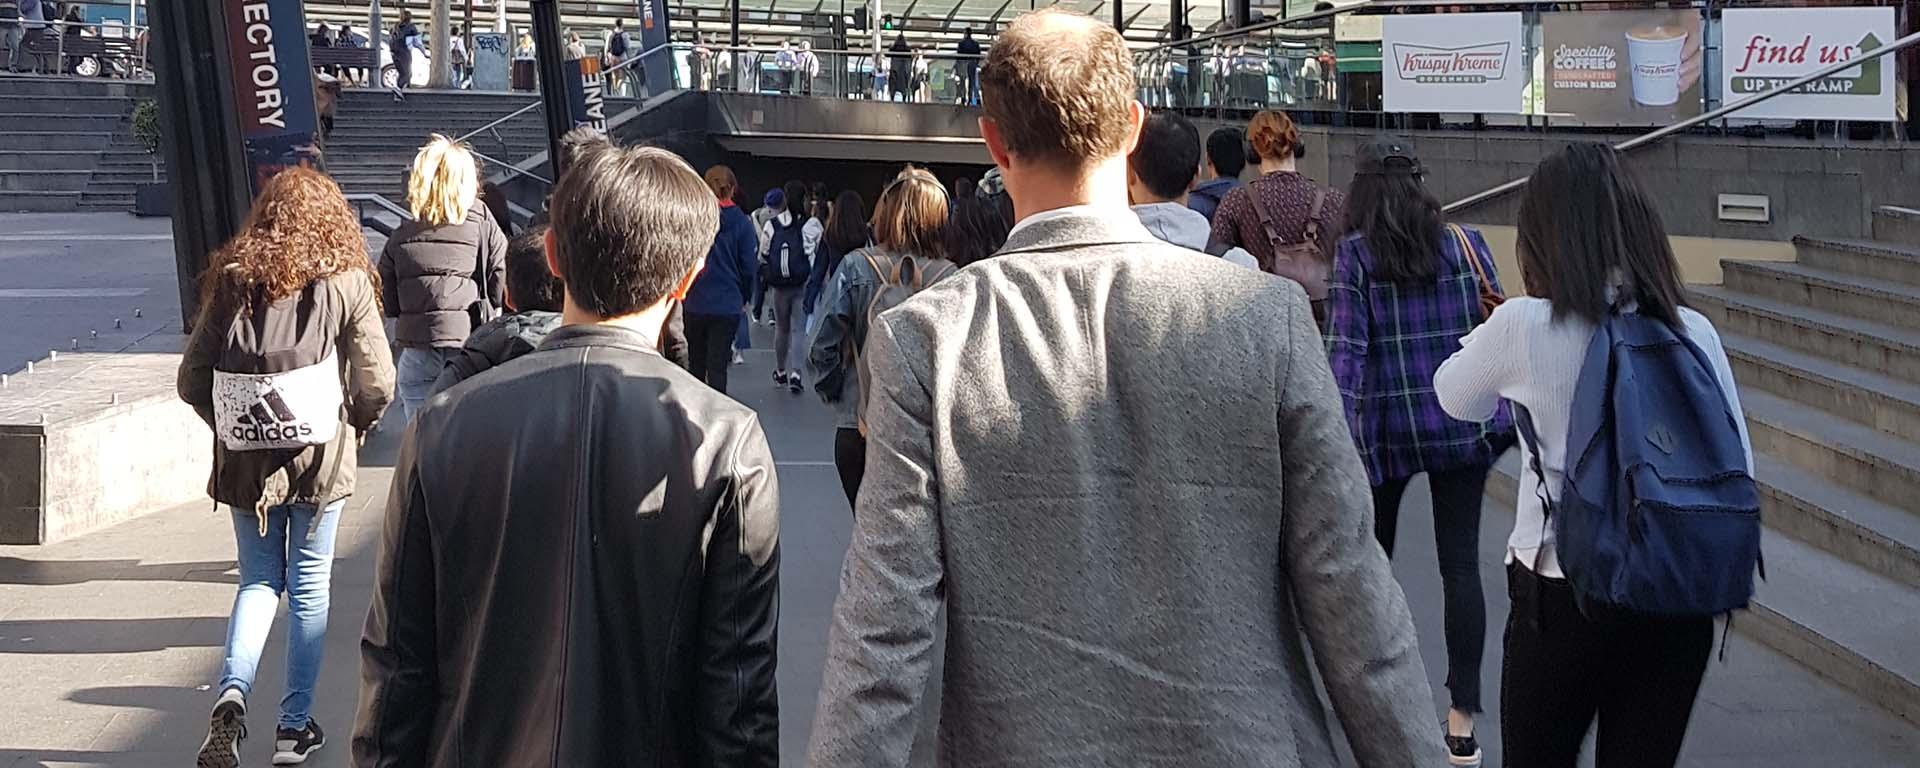 People seen walking, from the back, in Sydney